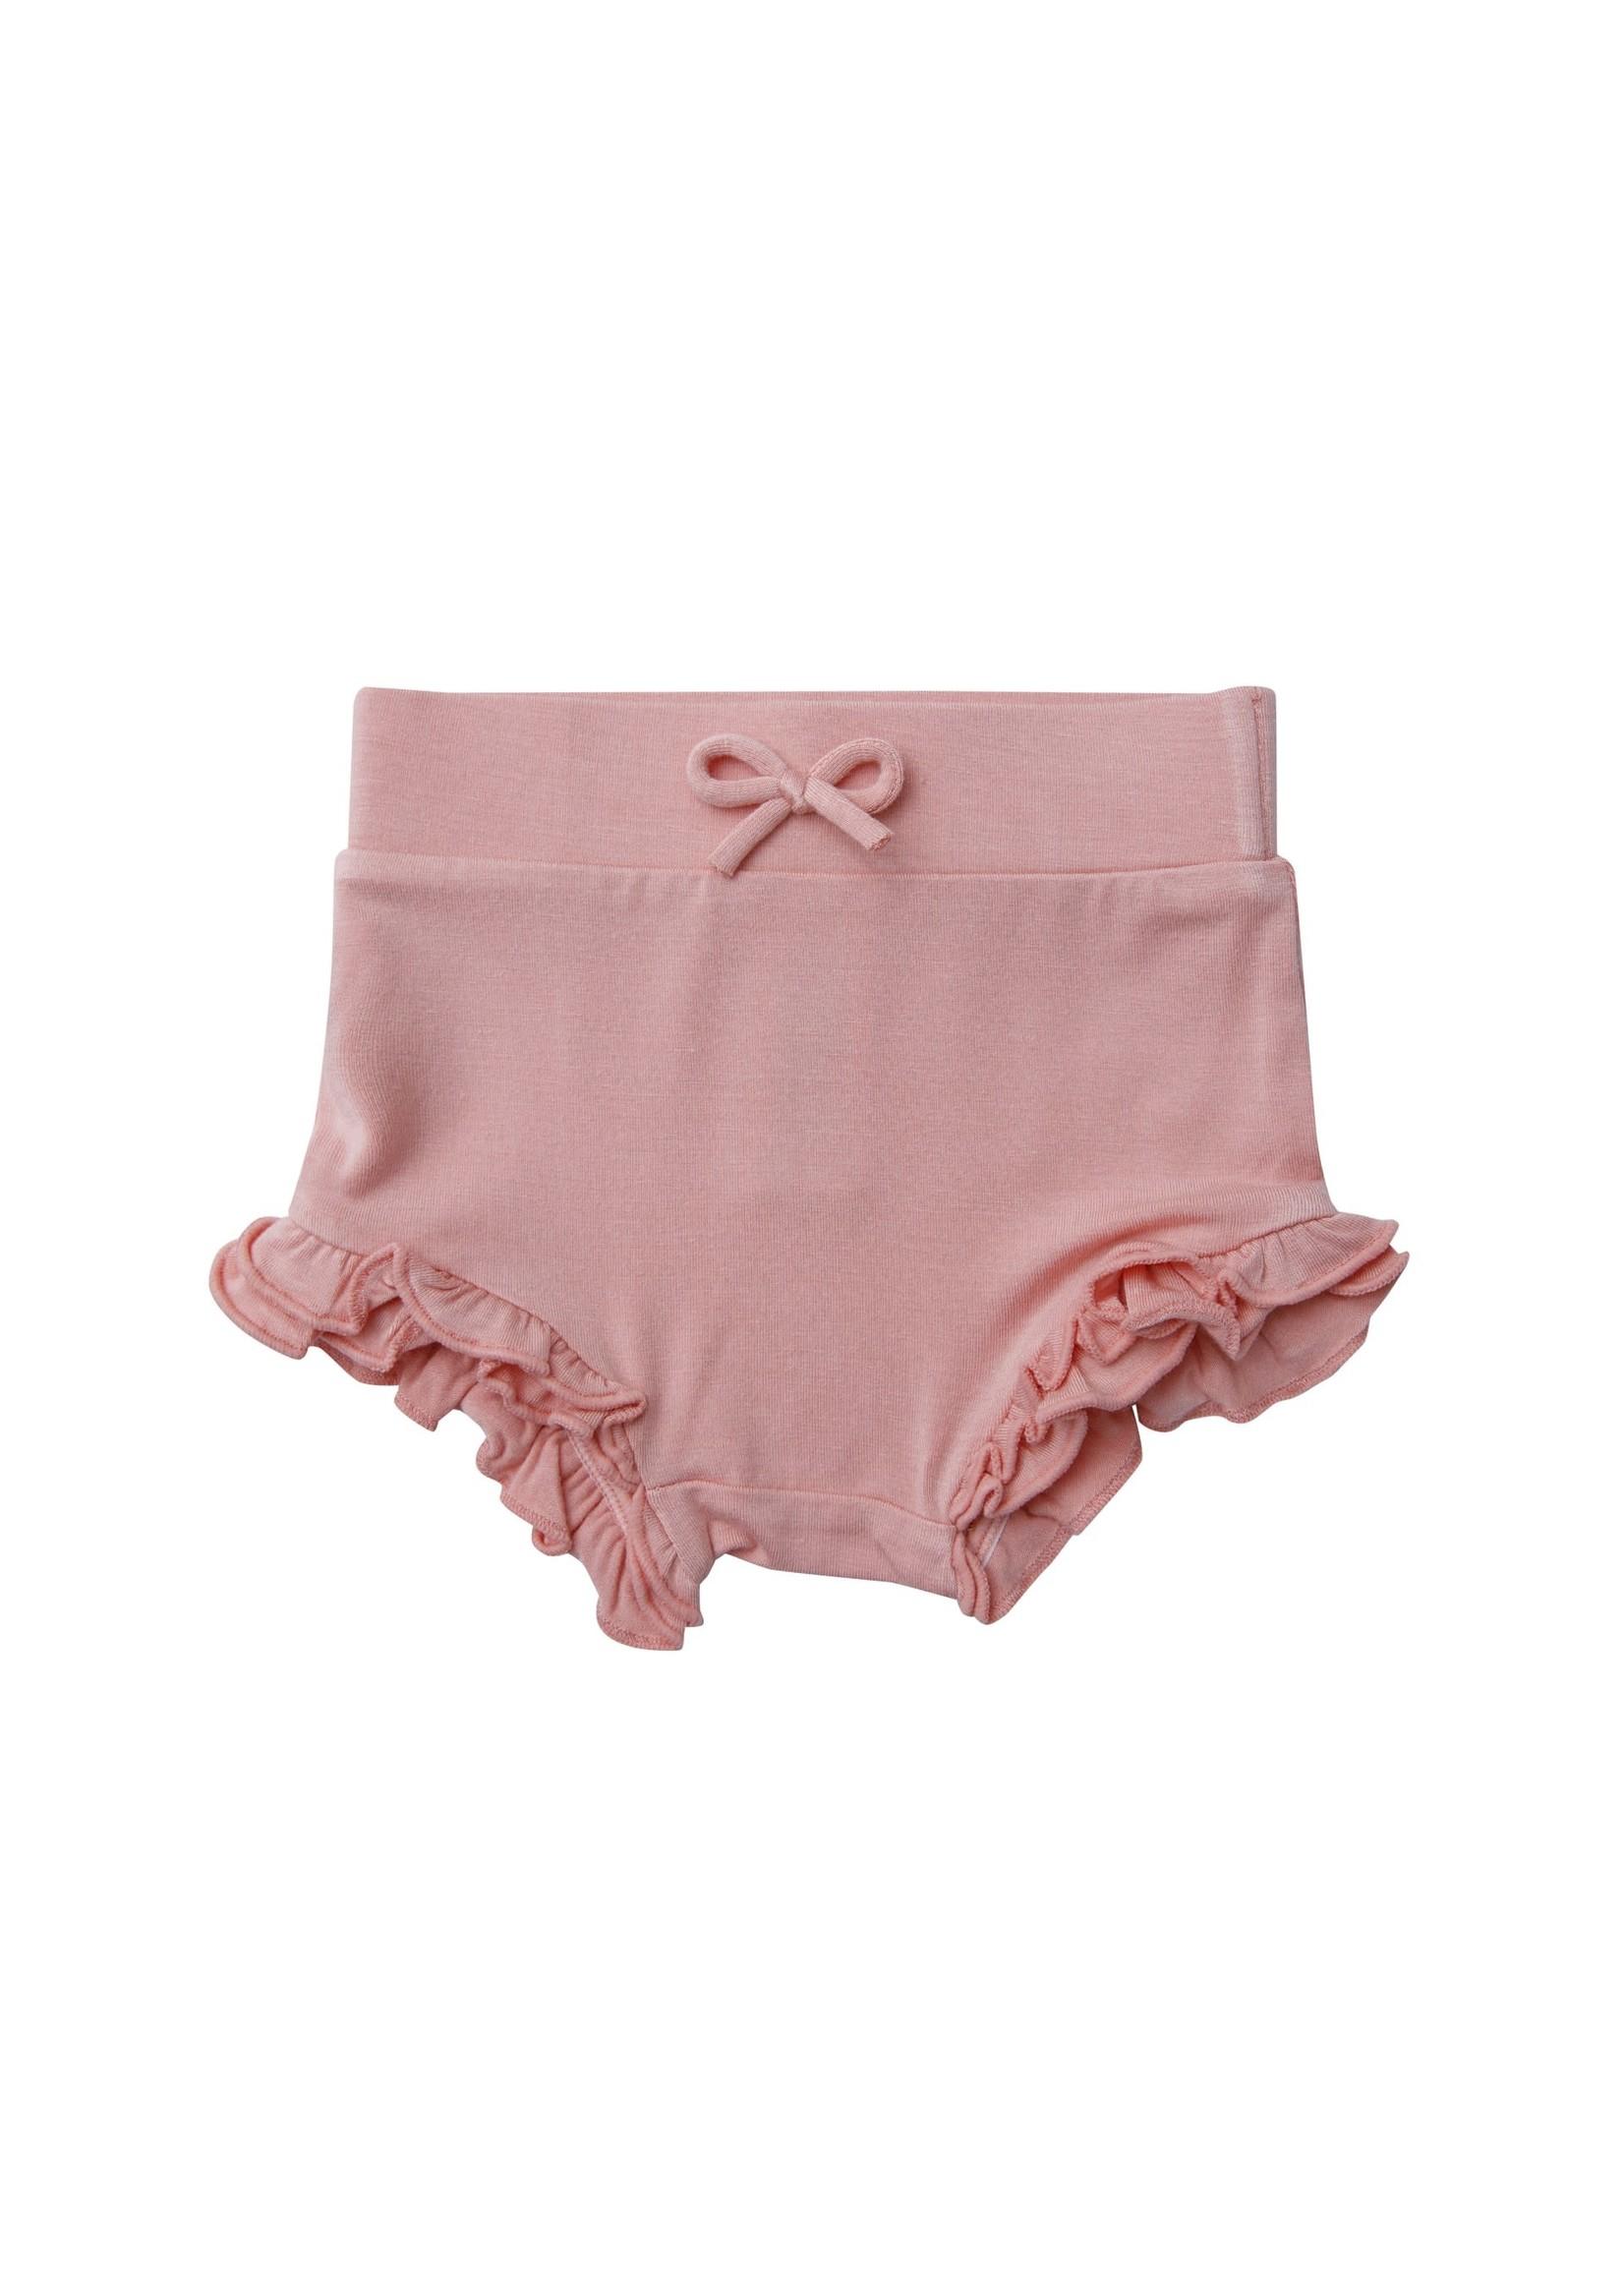 Angel Dear Angel Dear Solid Basics High Waist Shorts - Pink